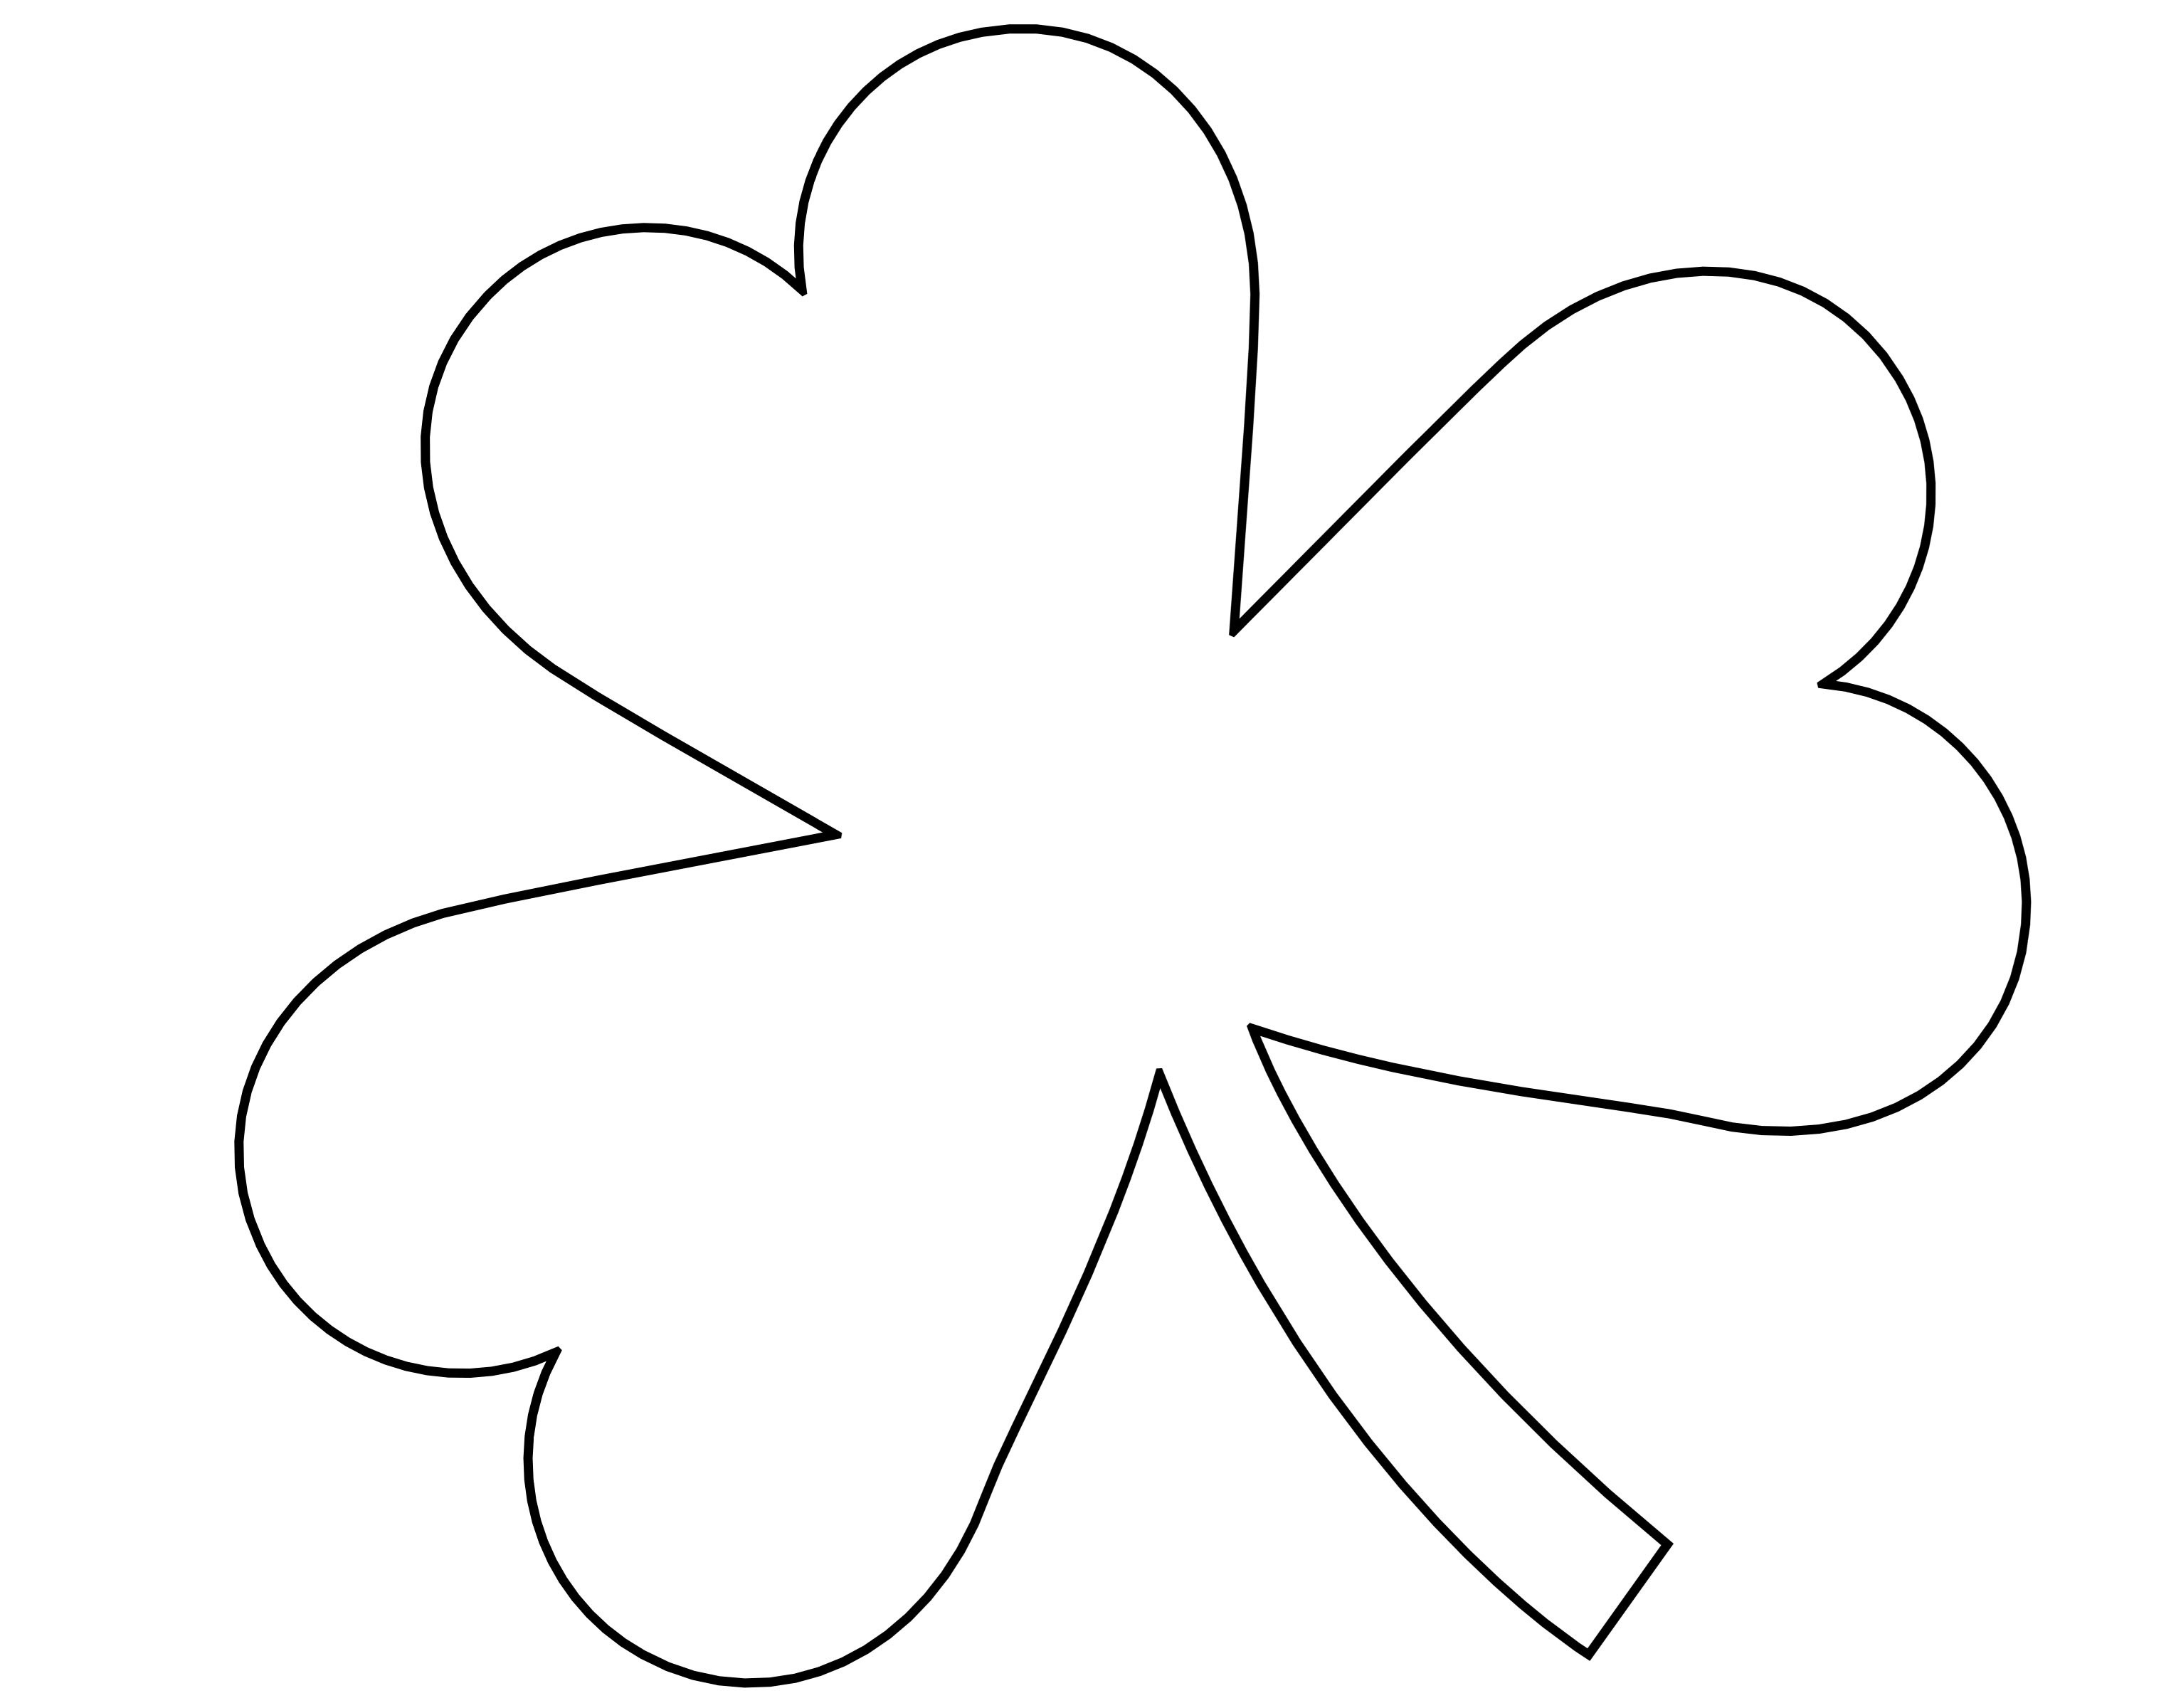 Free Outline Of Shamrock, Download Free Clip Art, Free Clip Art On - Free Printable Shamrock Cutouts